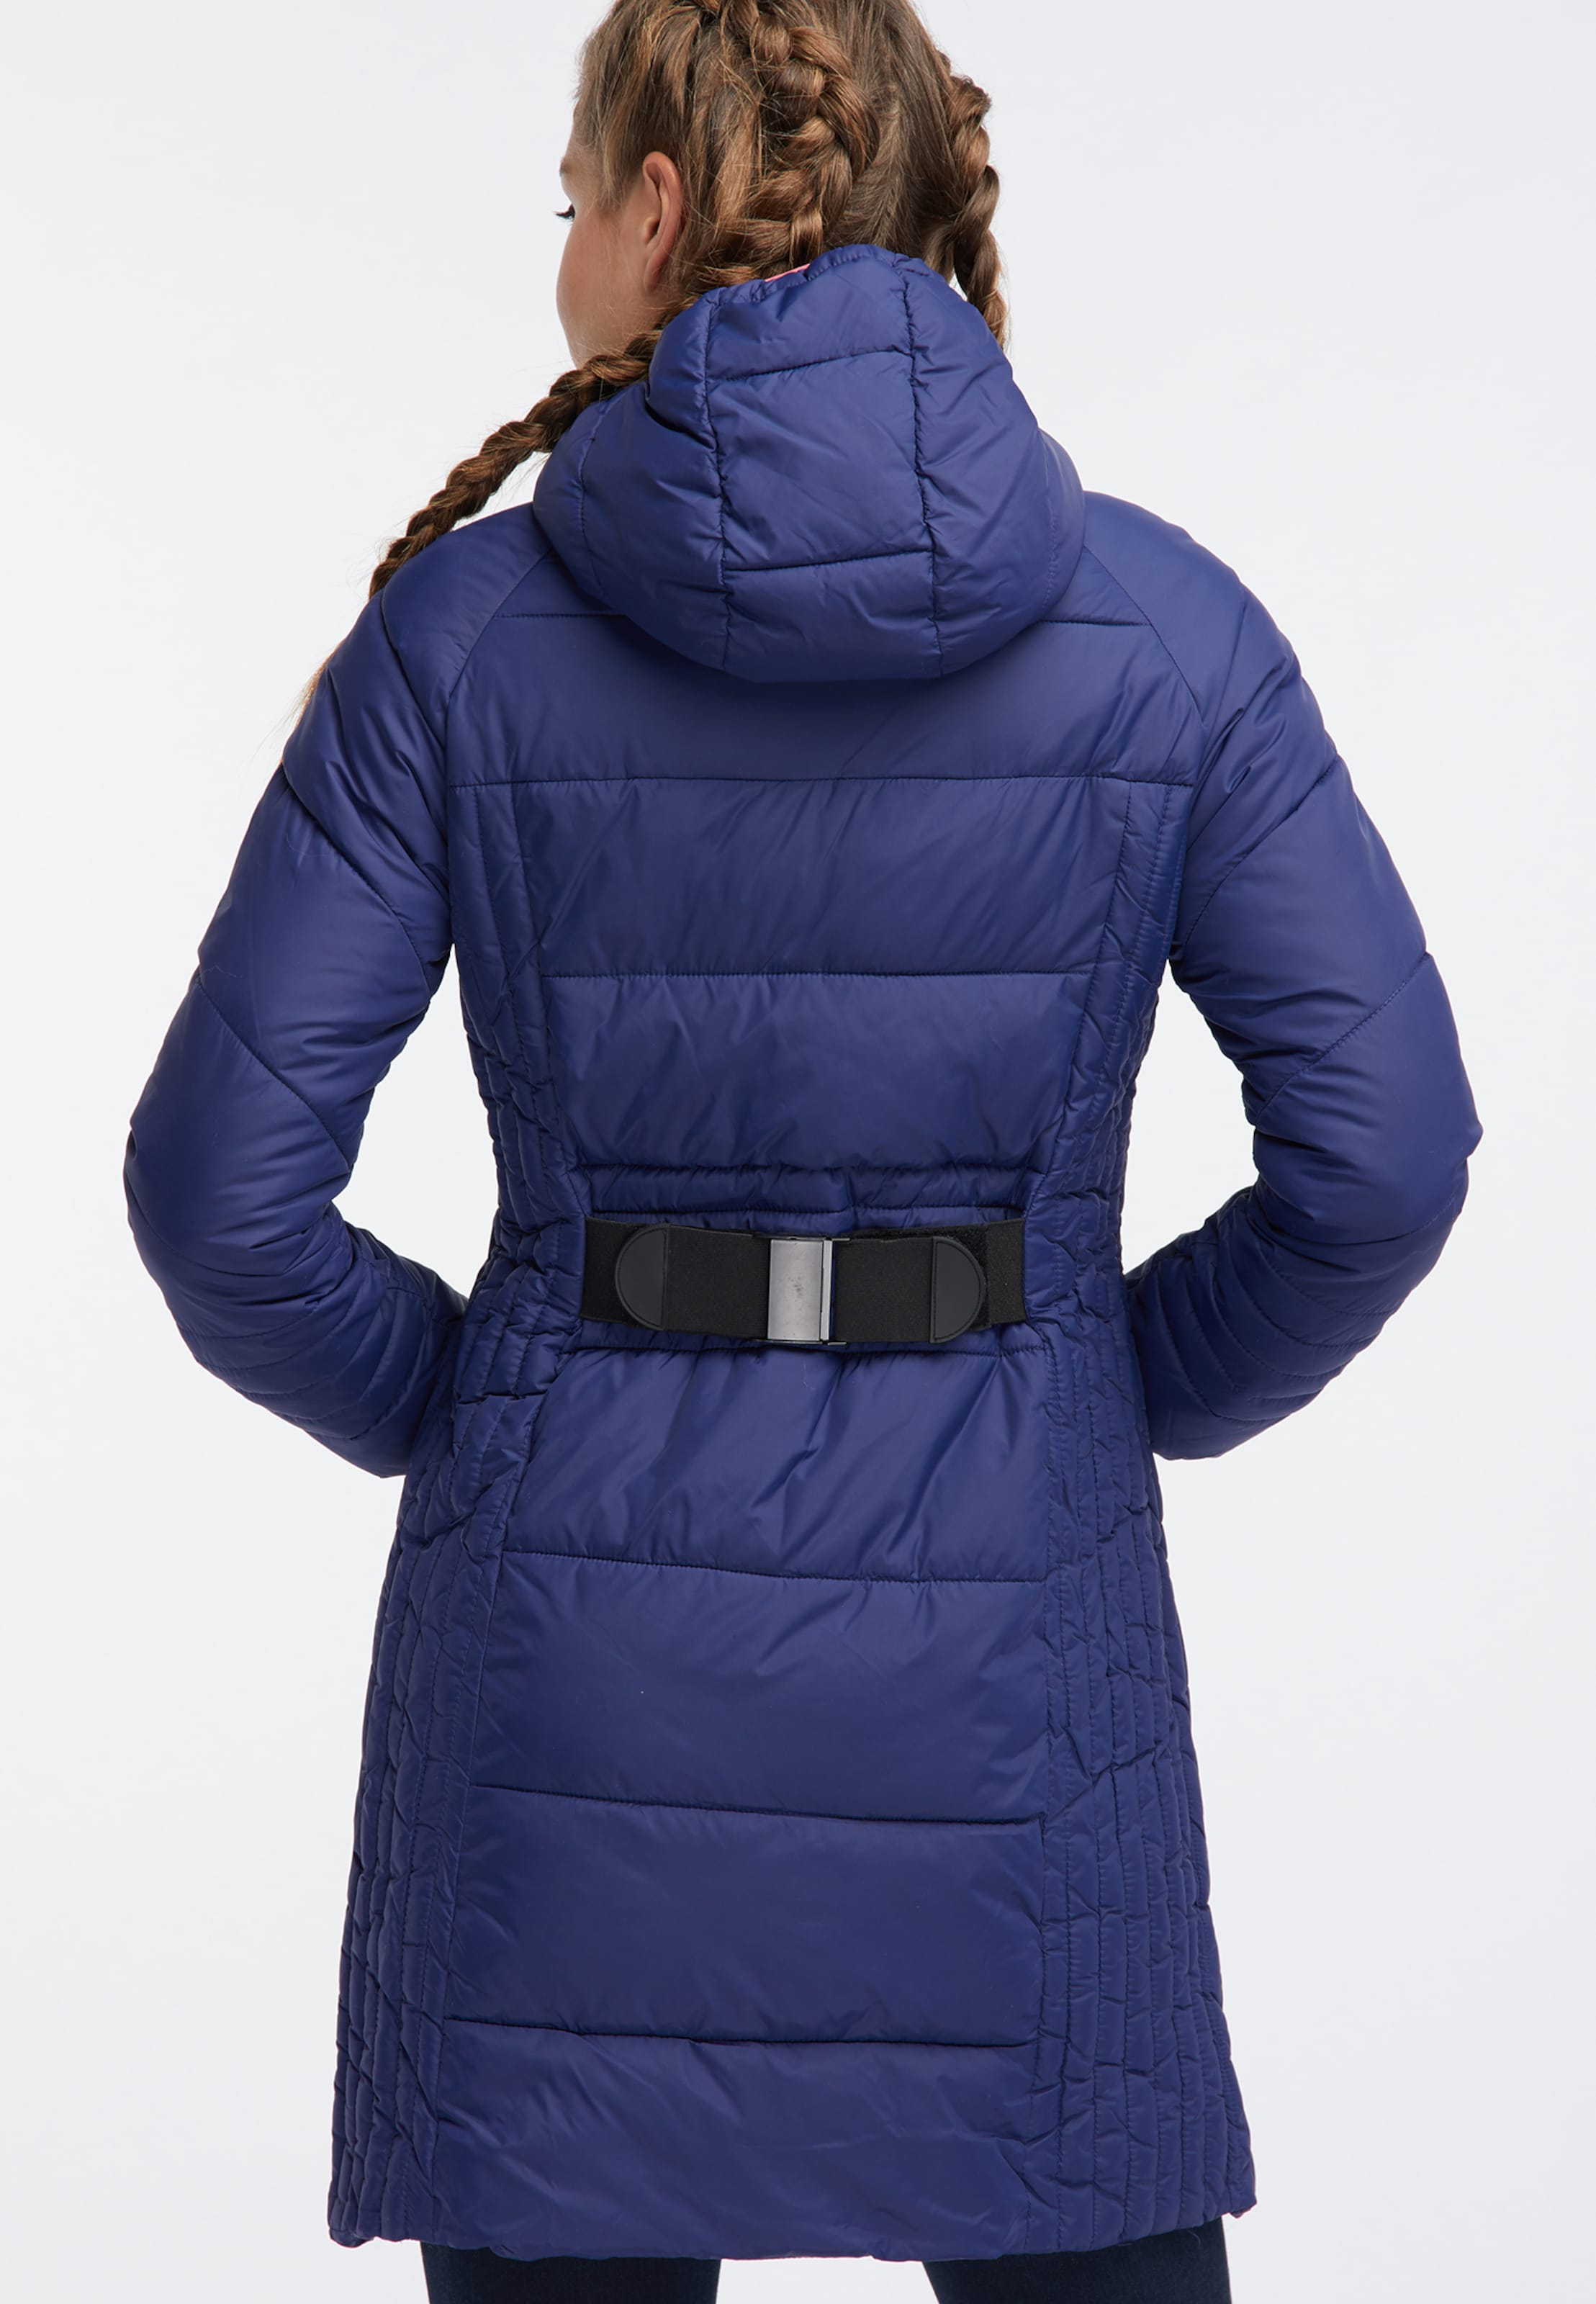 Outremer Manteau Mymo En Bleu D'hiver nOPX8wk0